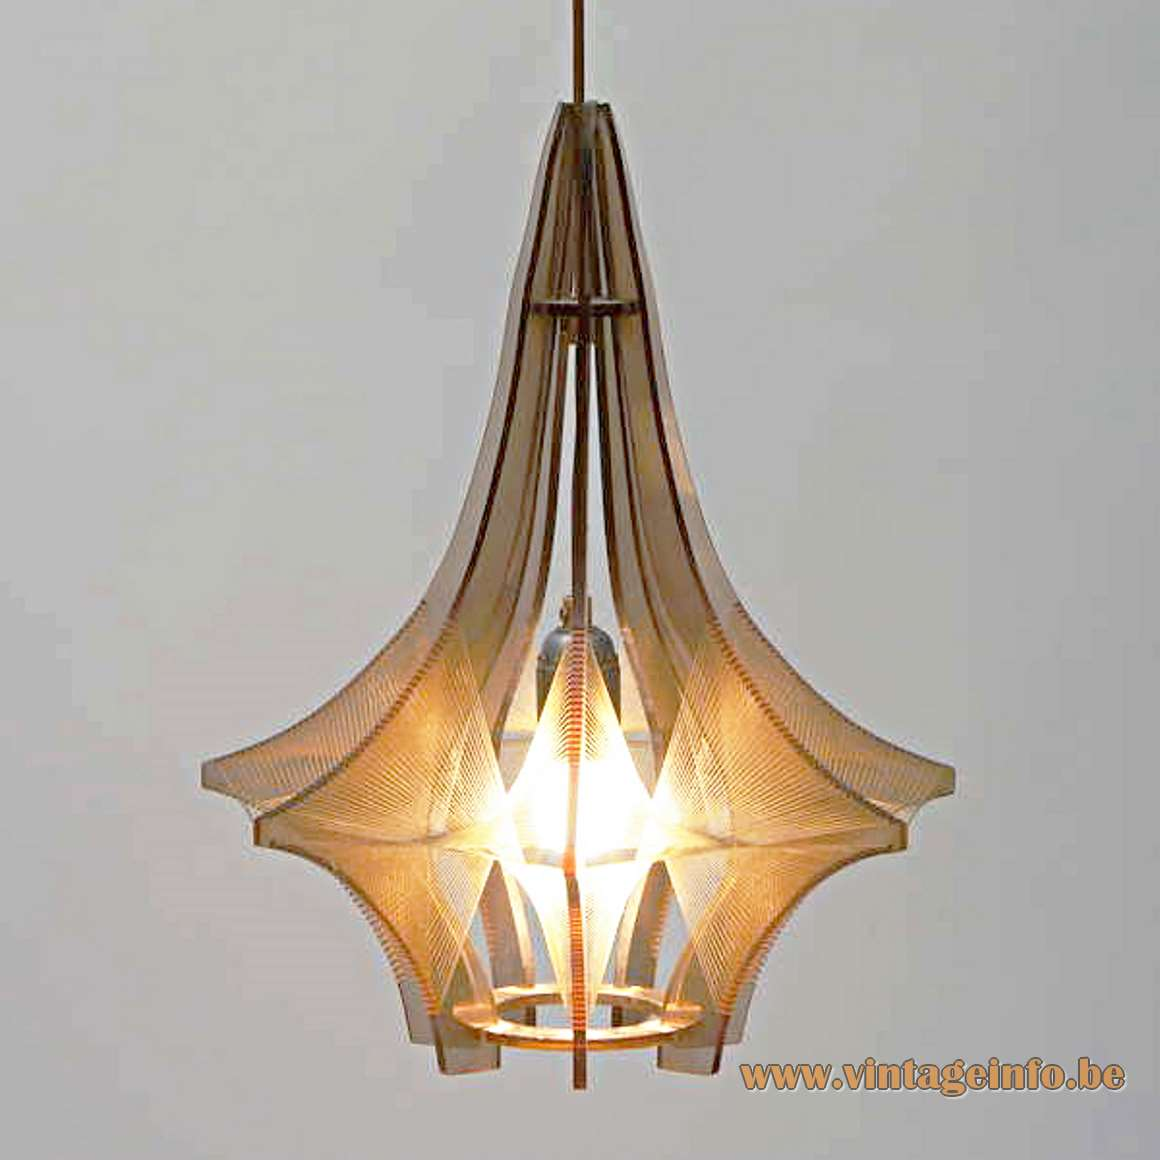 Paul Secon - Sompex Pendant Light